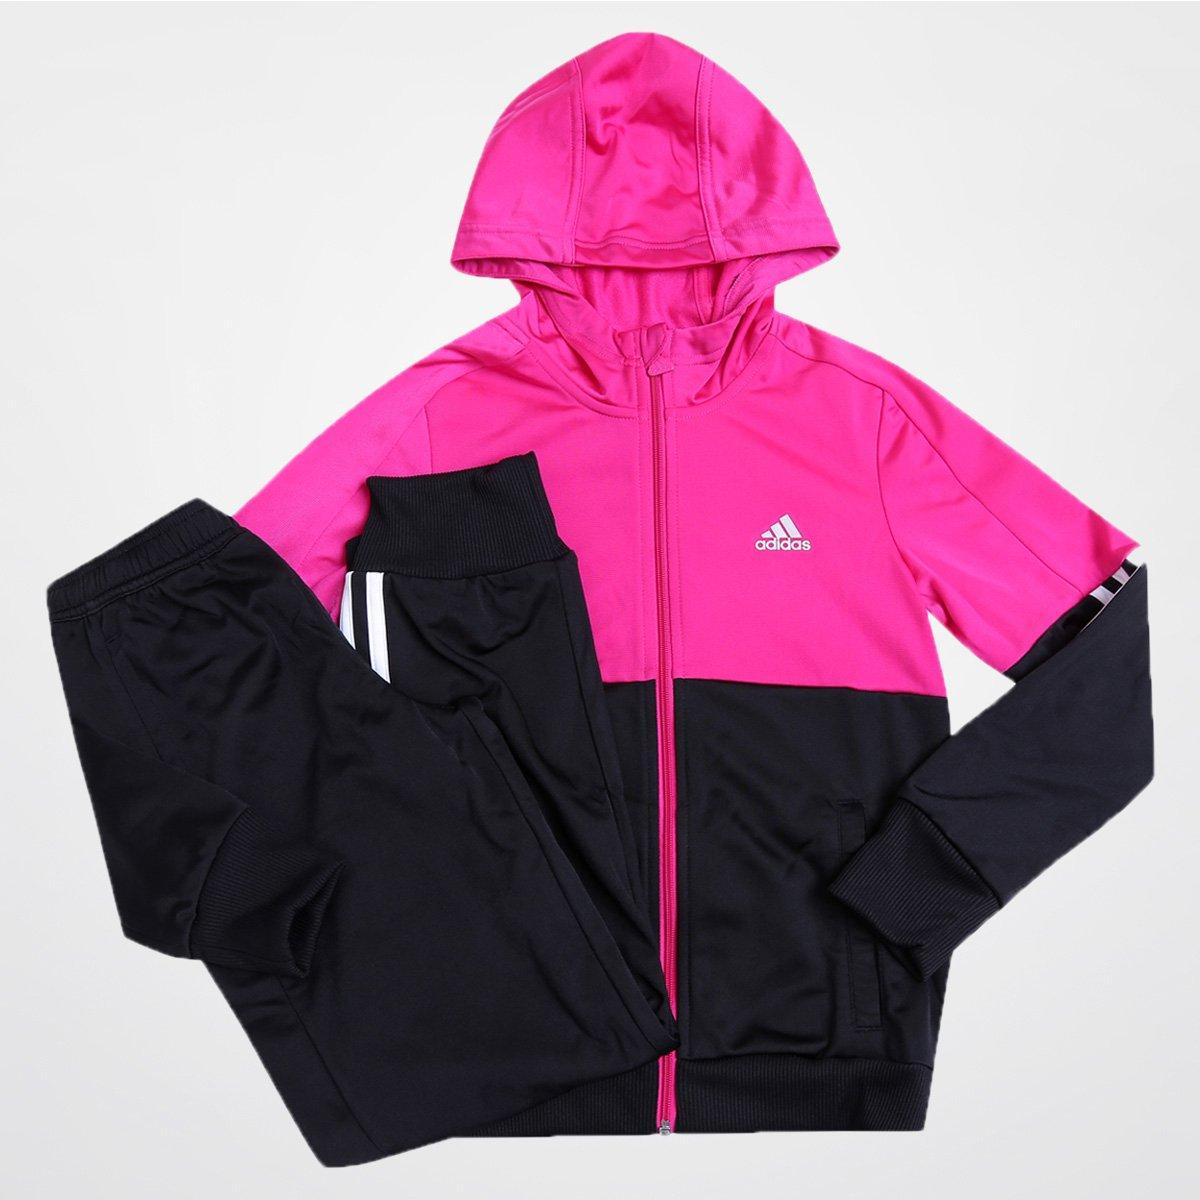 d0451a9c6c0 Agasalho Adidas Lg Ess Hd Pes T c  Capuz Infantil - Compre Agora ...